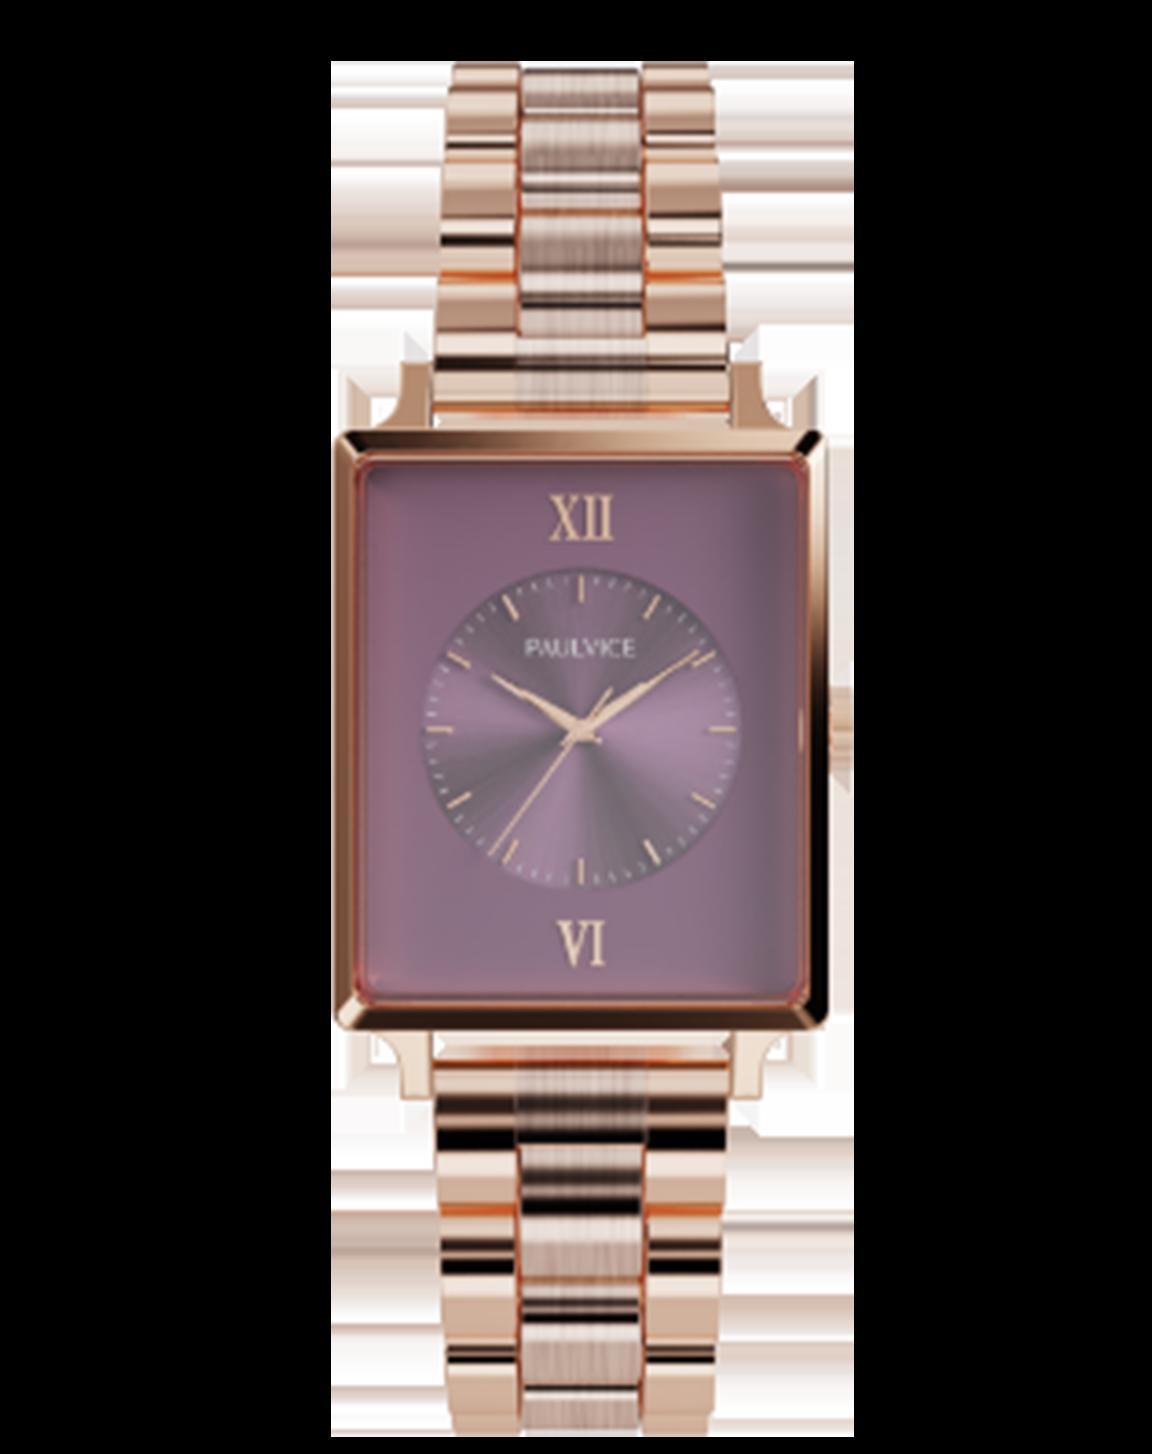 affordable luxury watch, korean women, korean fashion, korean style, korean women look, korean lookbook, fashion watch, korean brands, korean products, best watches for women, ladies watch, feminine watch, lightweight women watch, korean products, PAULVICE, PAULVICE luxurious watches, gift watches